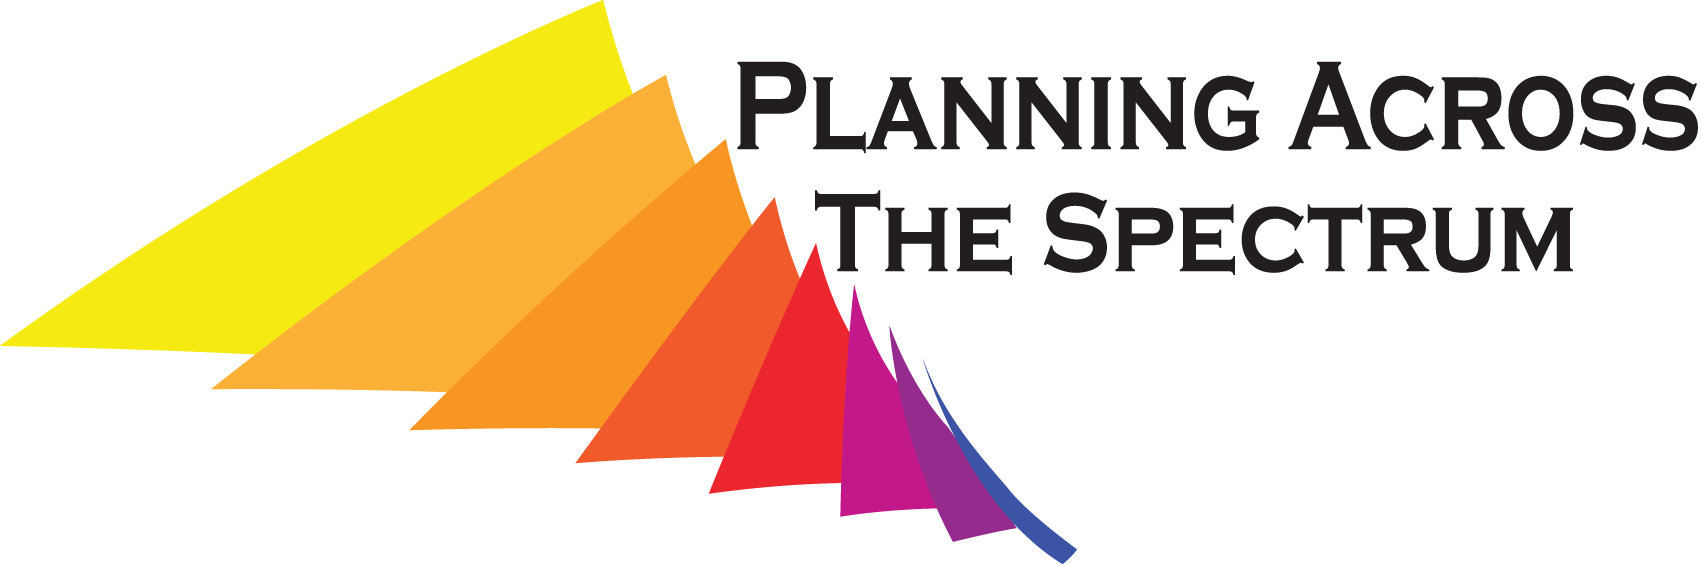 Planning Across The Spectrum Footer Logo